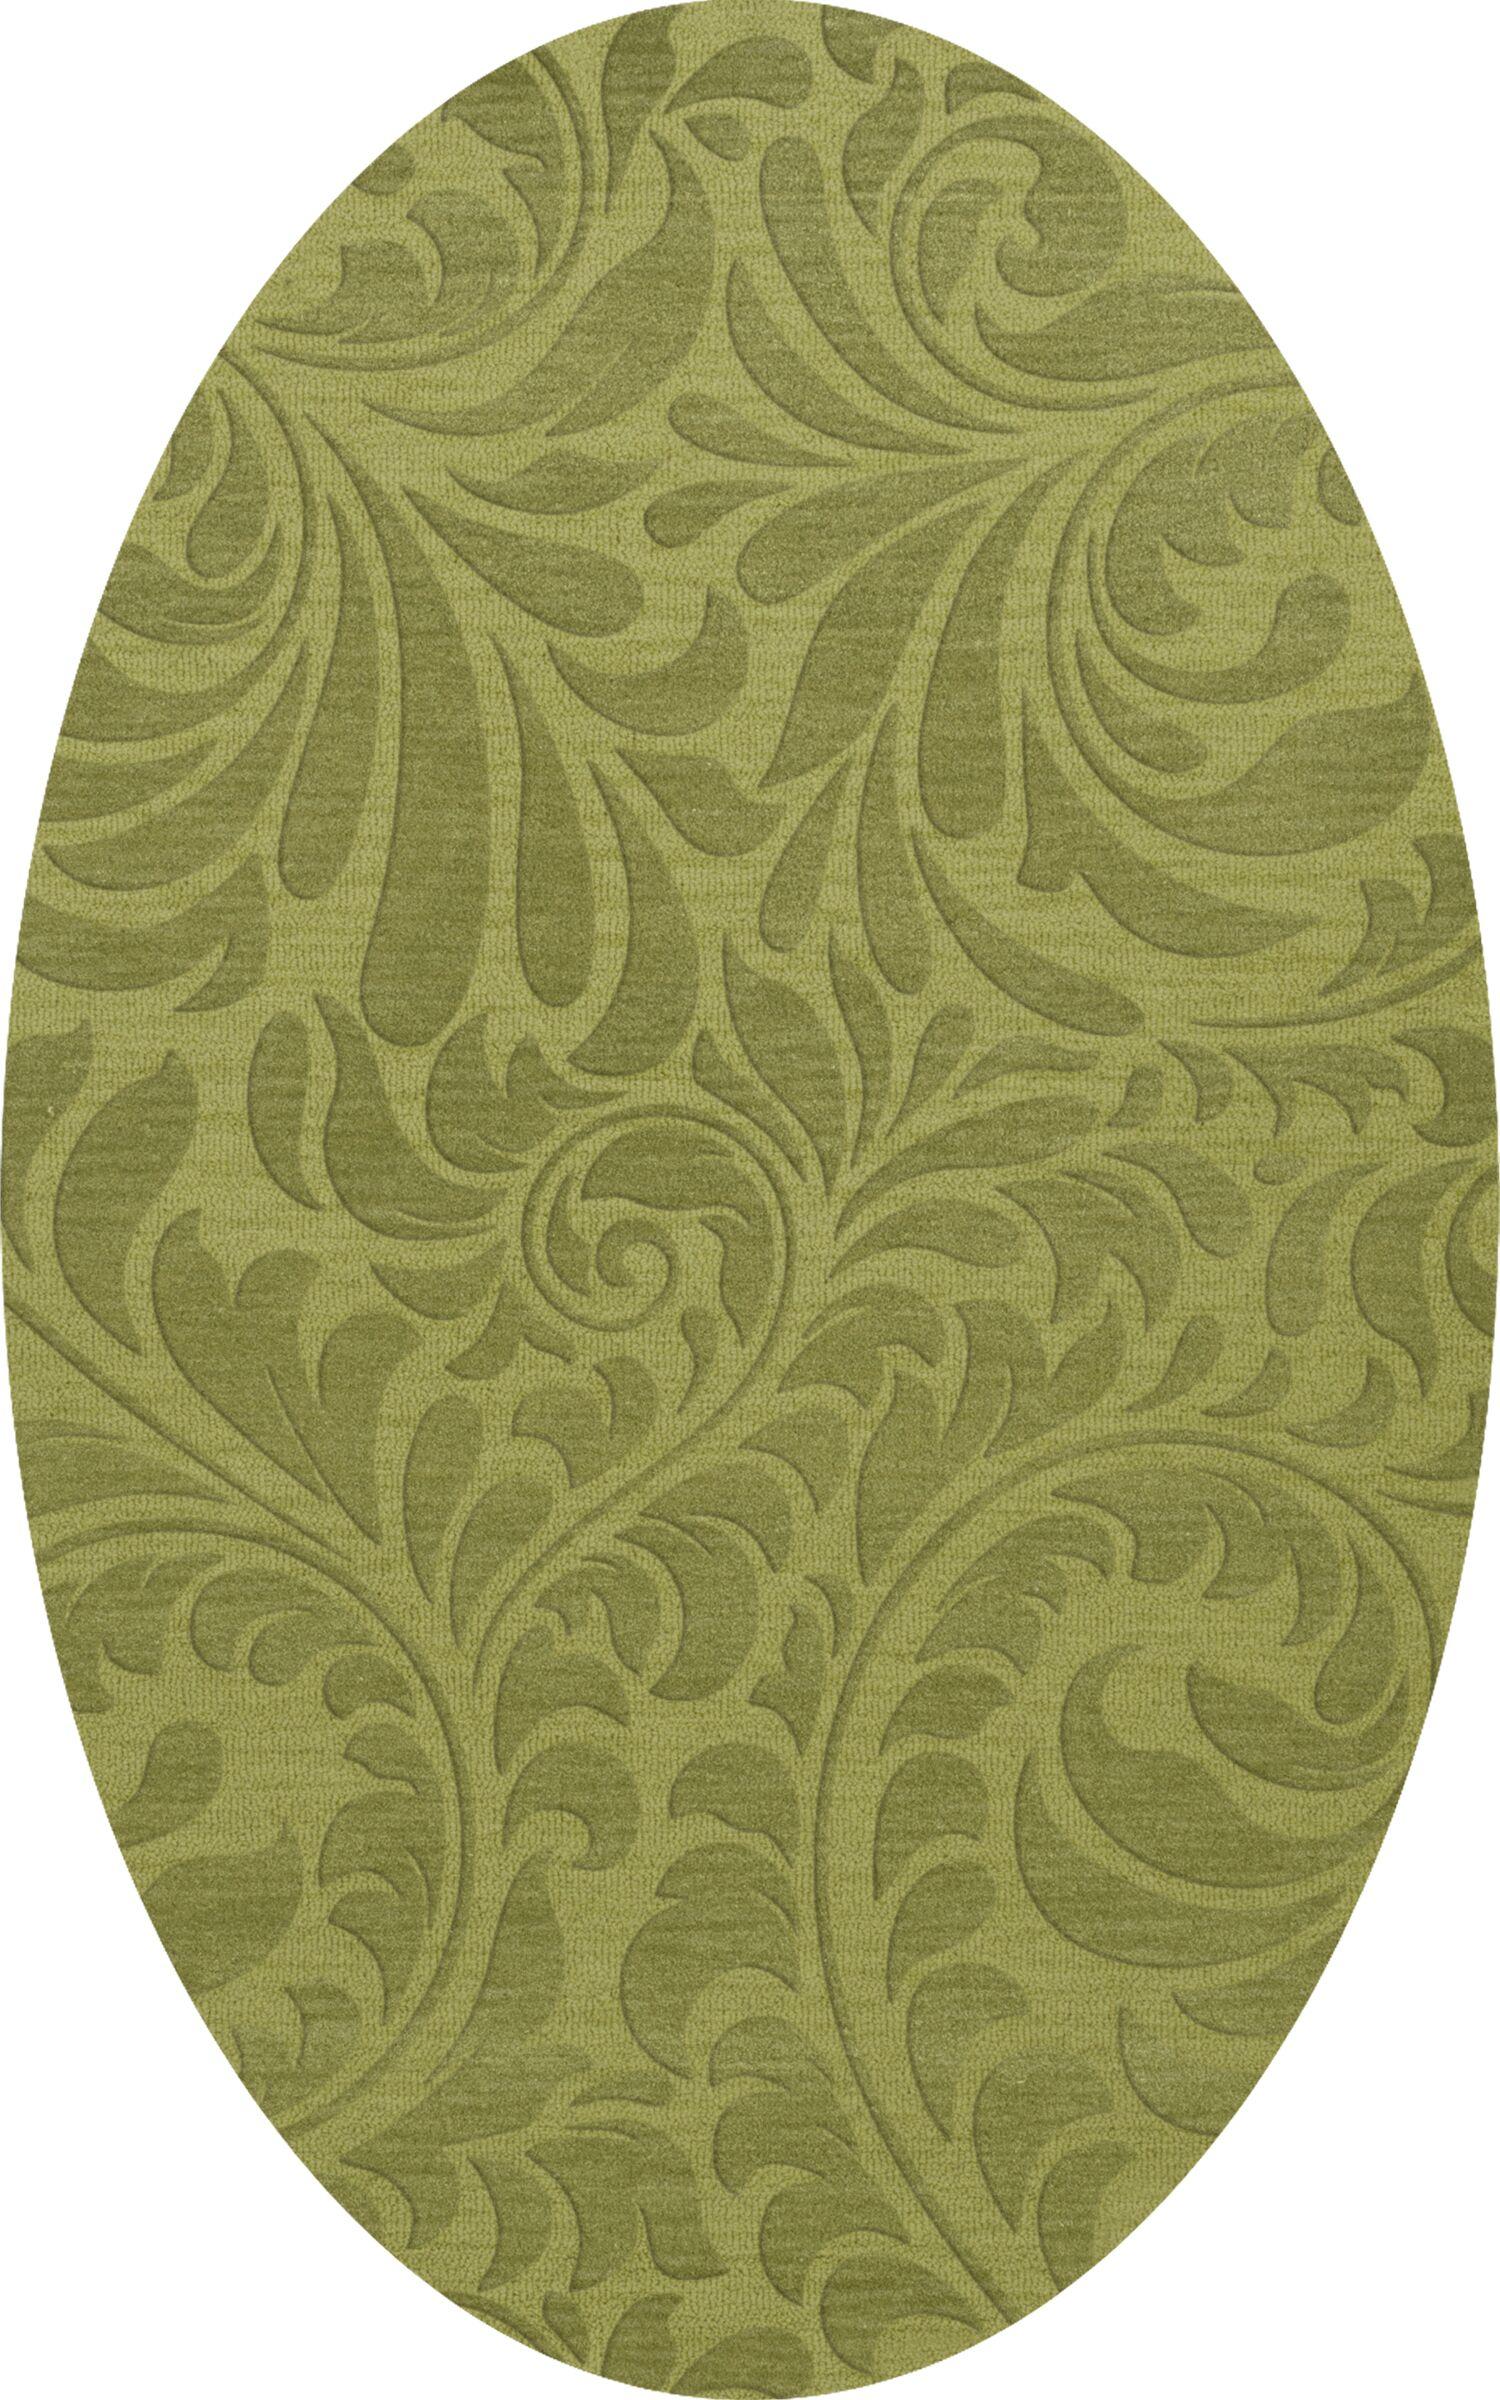 Bella Machine Woven Wool Green Pad Area Rug Rug Size: Oval 4' x 6'